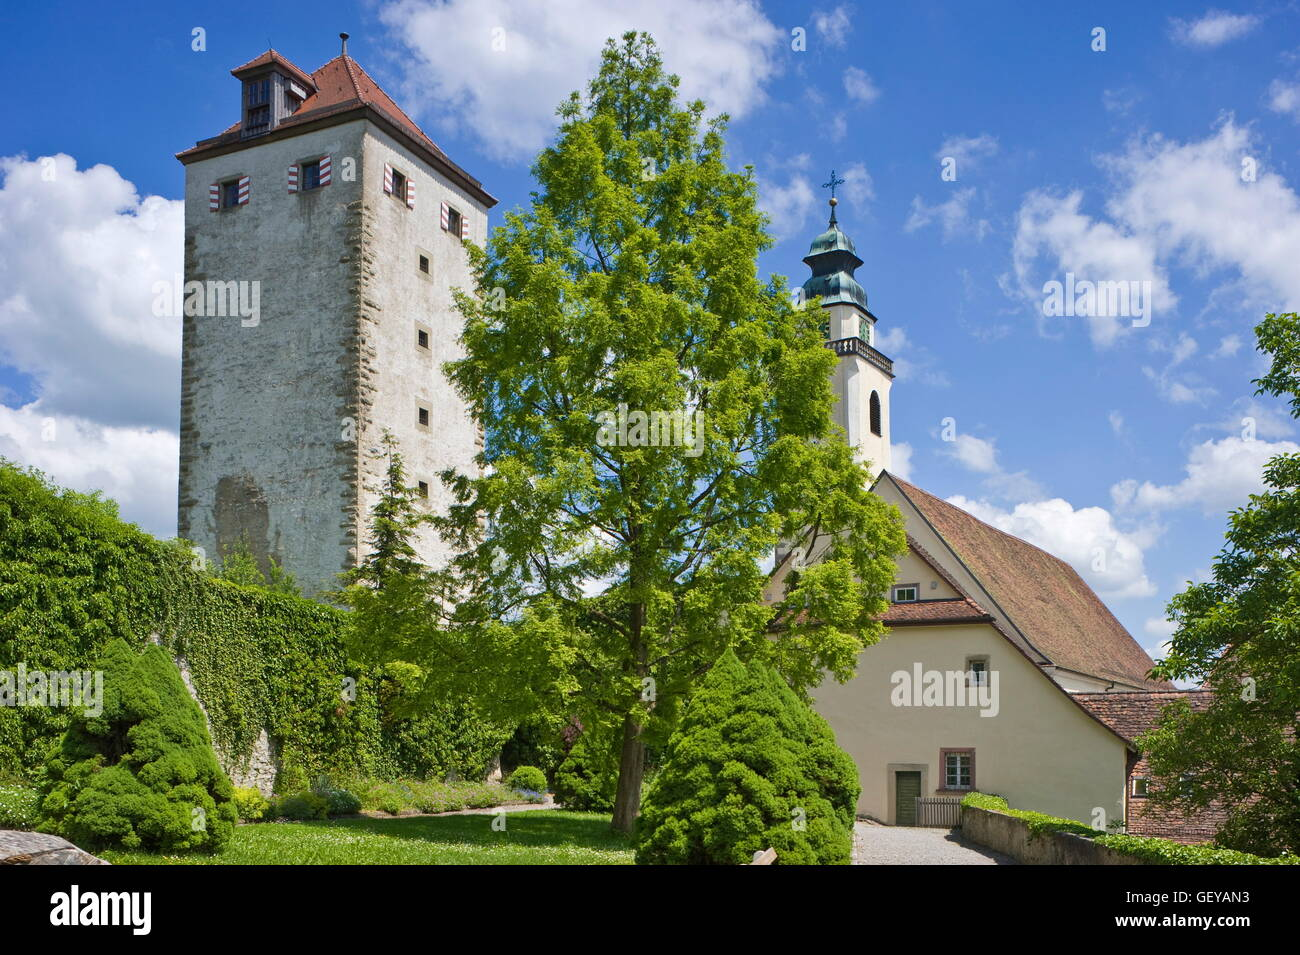 Géographie / voyage, Allemagne, Bade-Wurtemberg, Horb am Neckar, jardin du château avec Schurkenturm (blackguard Photo Stock